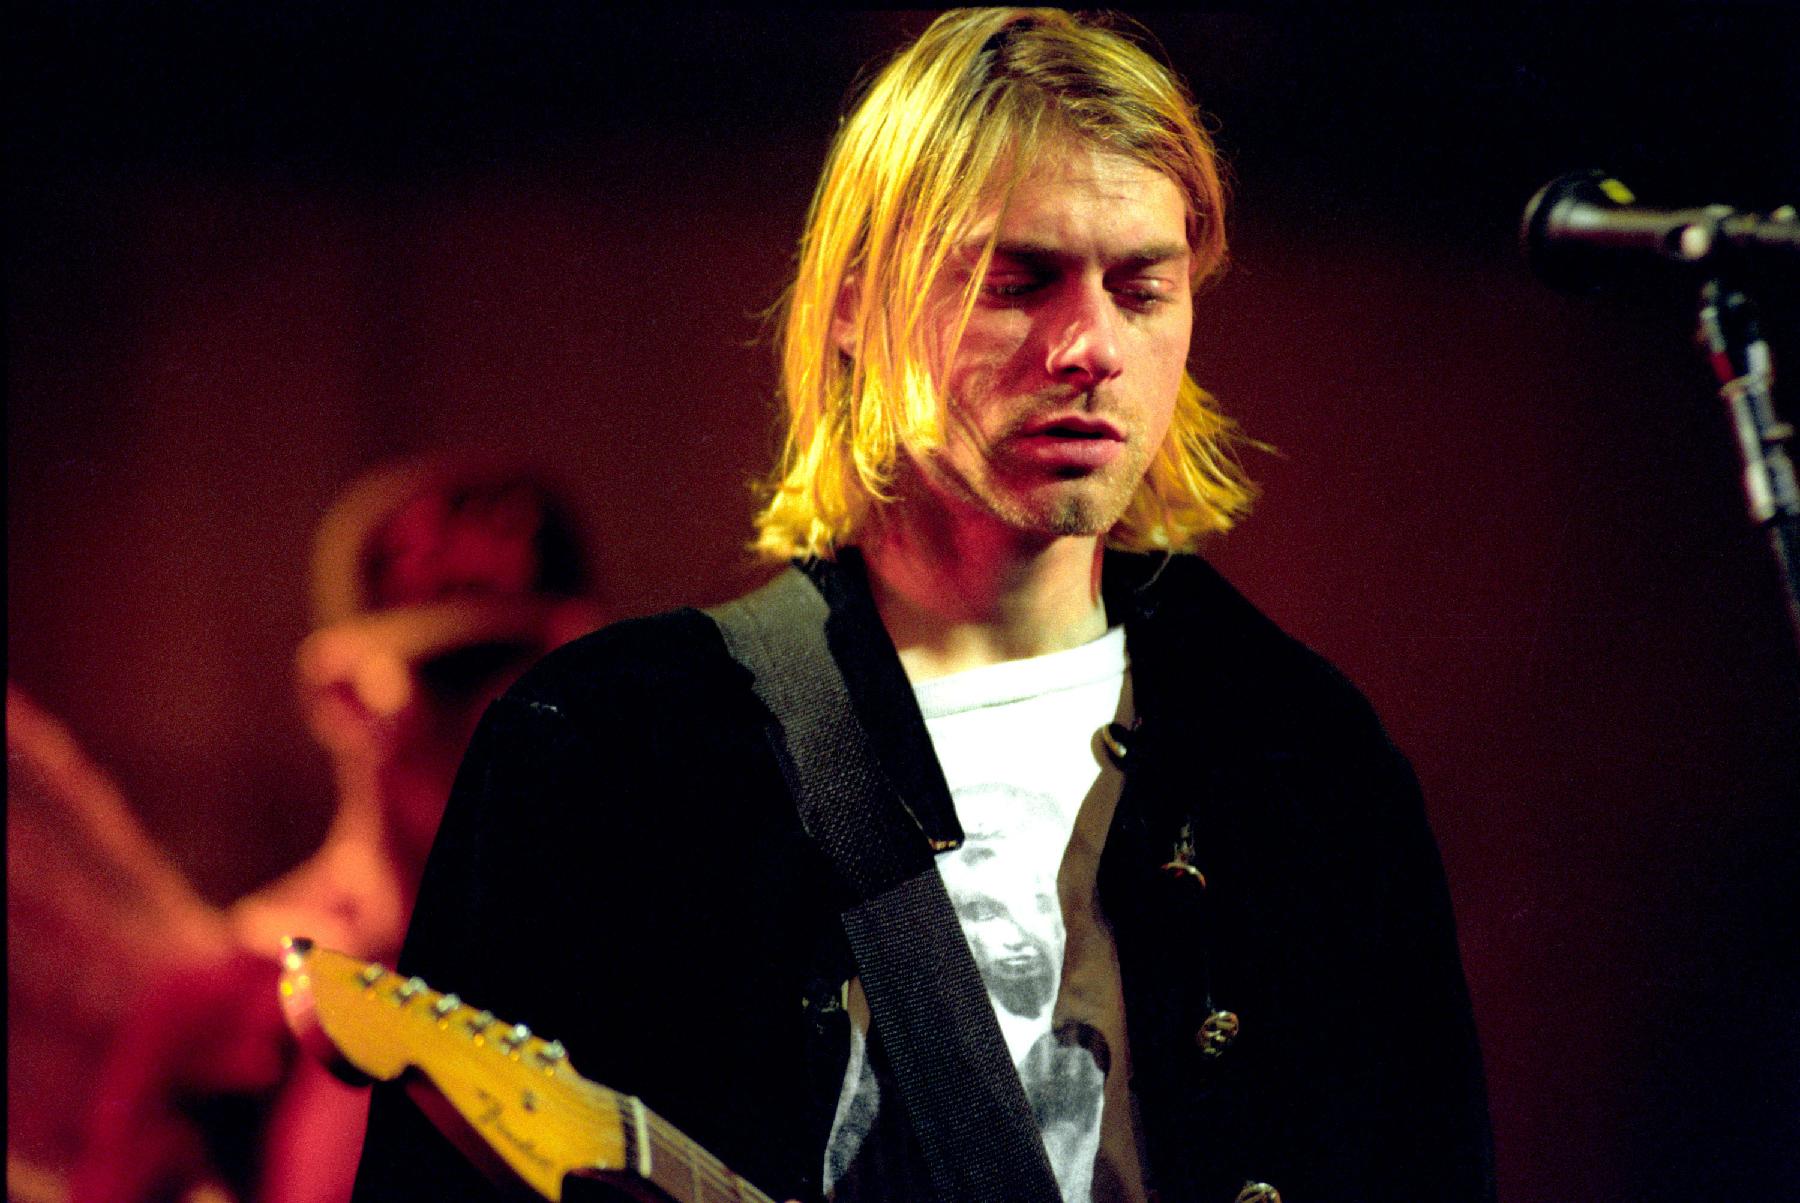 Kurt Cobain Getting His Own Comic Book